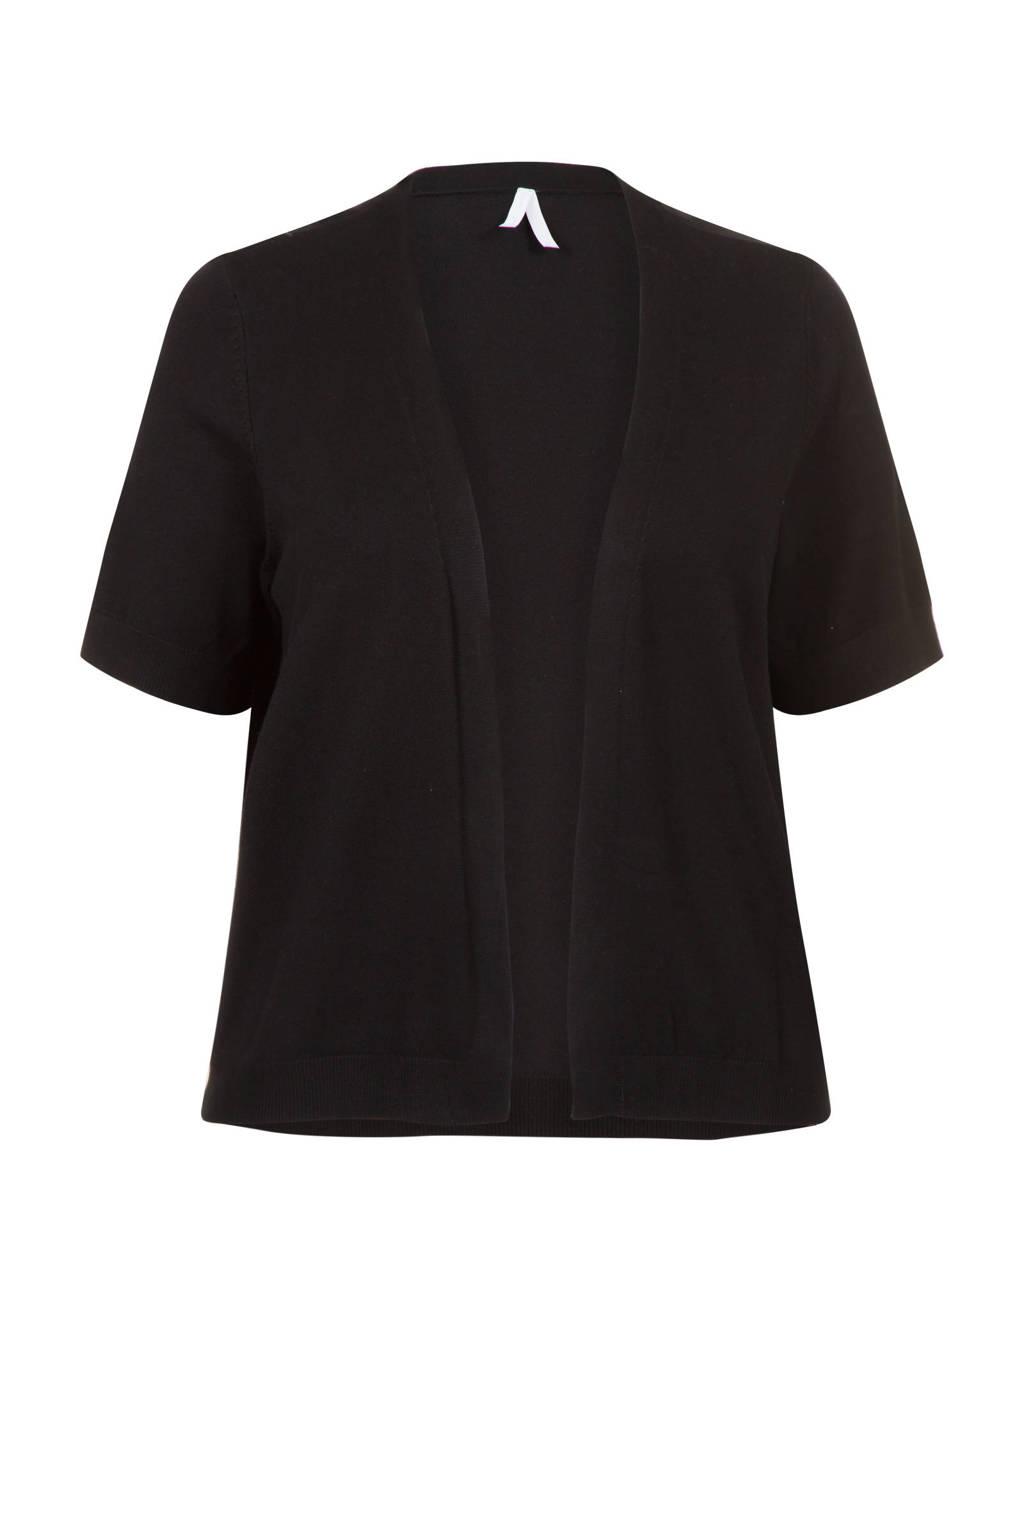 Miss Etam Plus vest zwart, Zwart